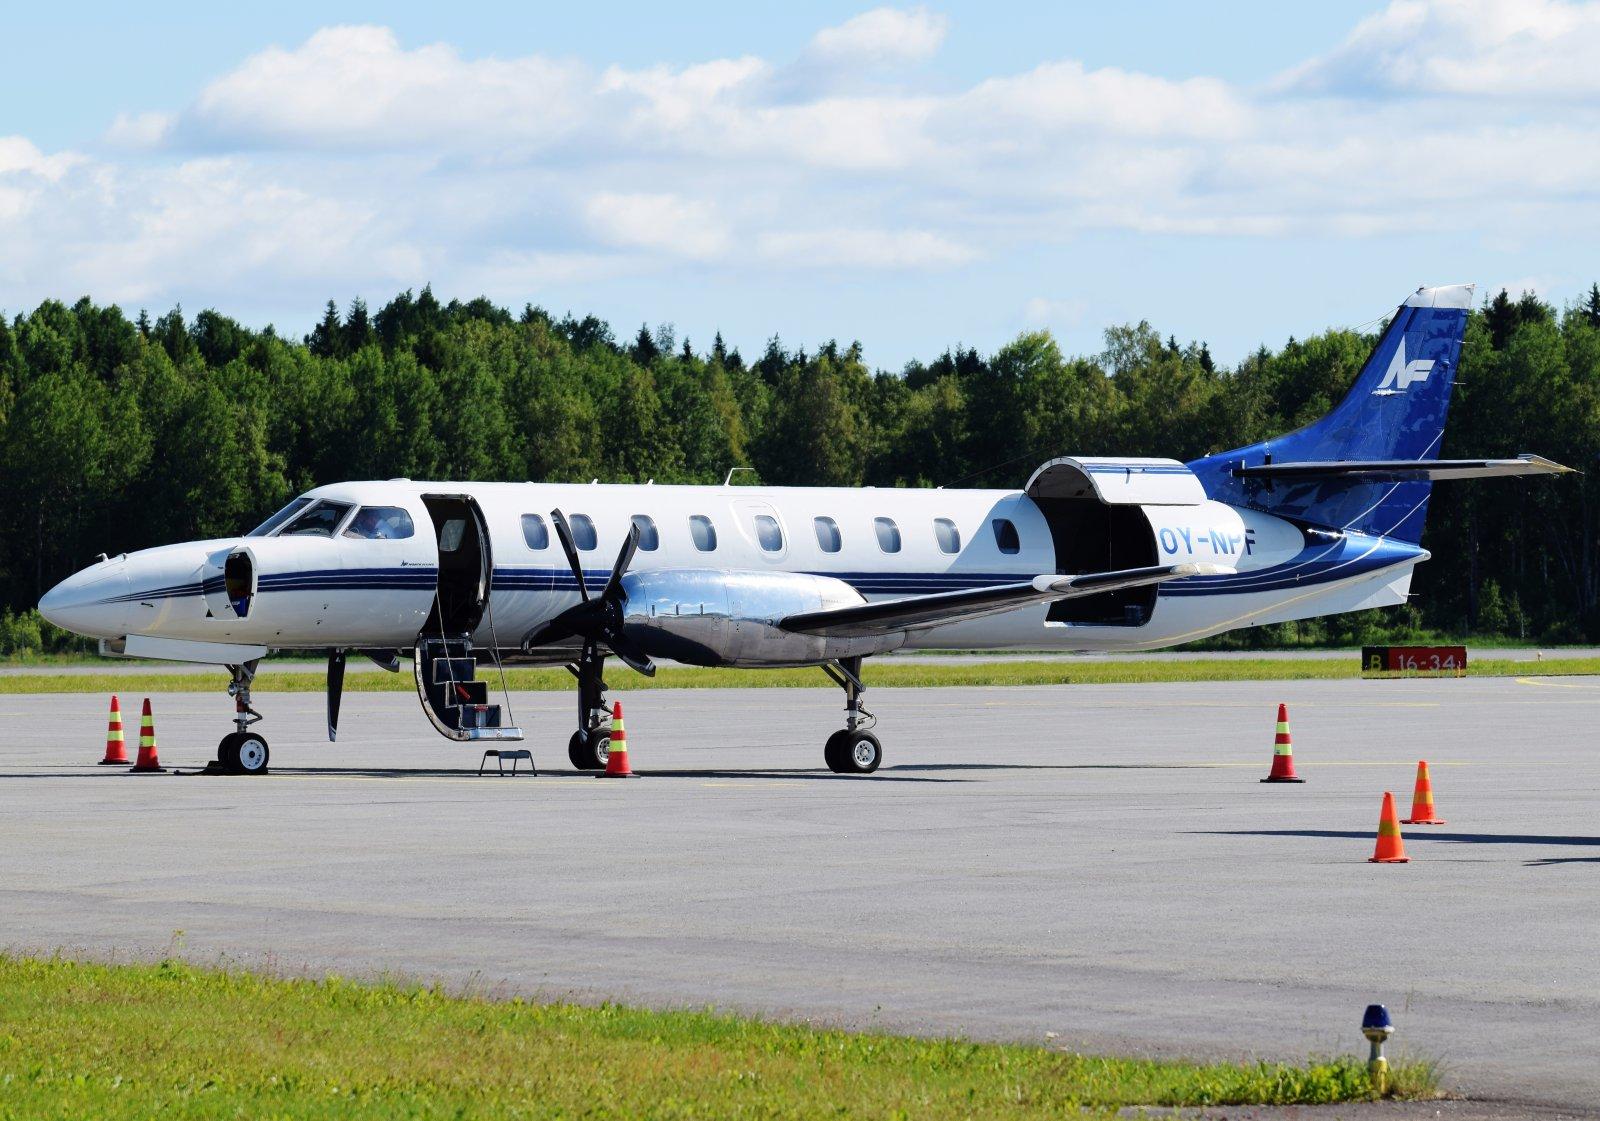 OY-NPF - Fairchild Swearingen SA.227DC Metro 23 - North Flying - 28.6.2019